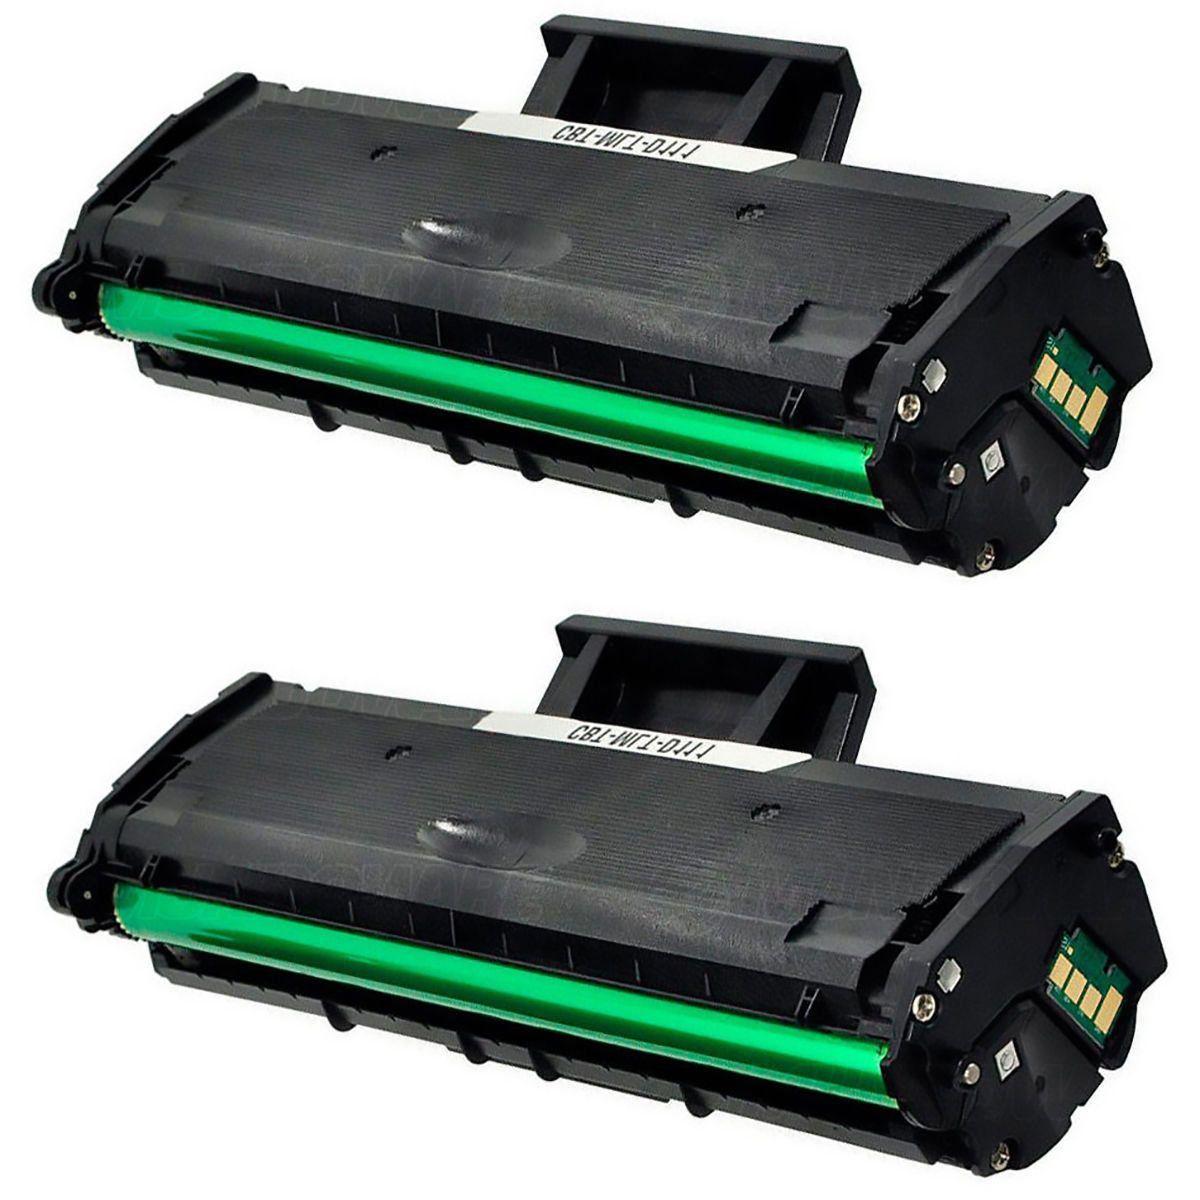 Compatível: Kit 2x Toner D111 MLT-D111S para Samsung M-2020 2020w 2020w/xaa 2020fw 2022w 2070w 2070fw / Preto / 1.000